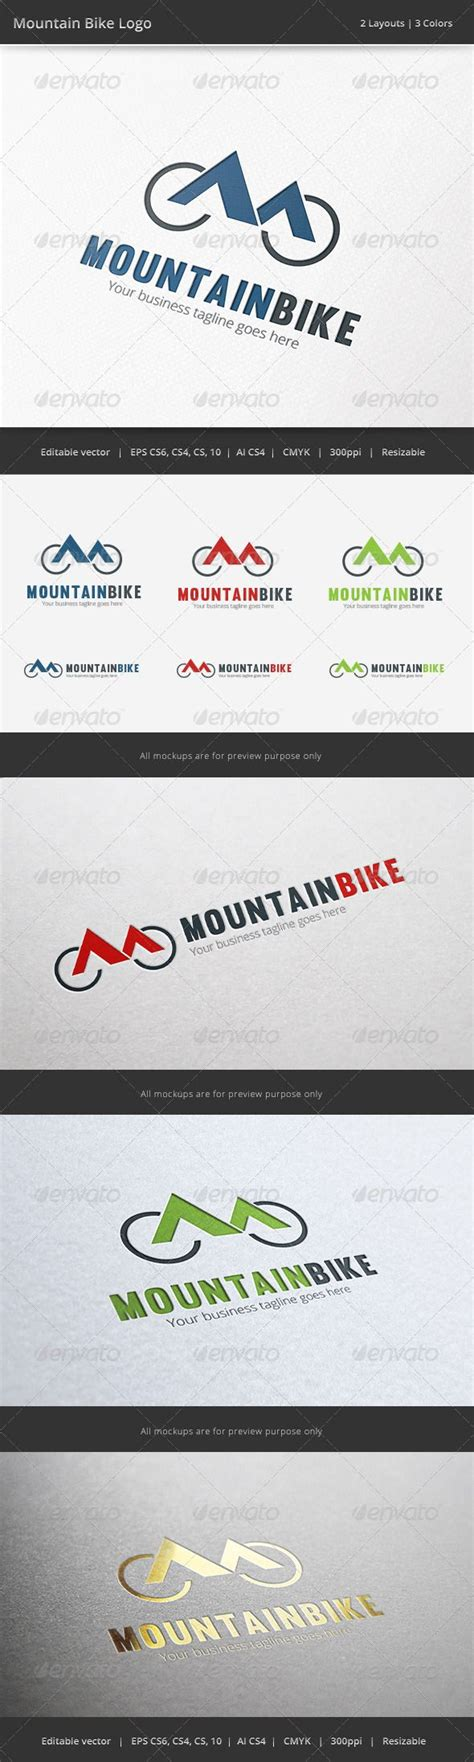 dafont zenzai itacha 106 best logo templates images on pinterest logo